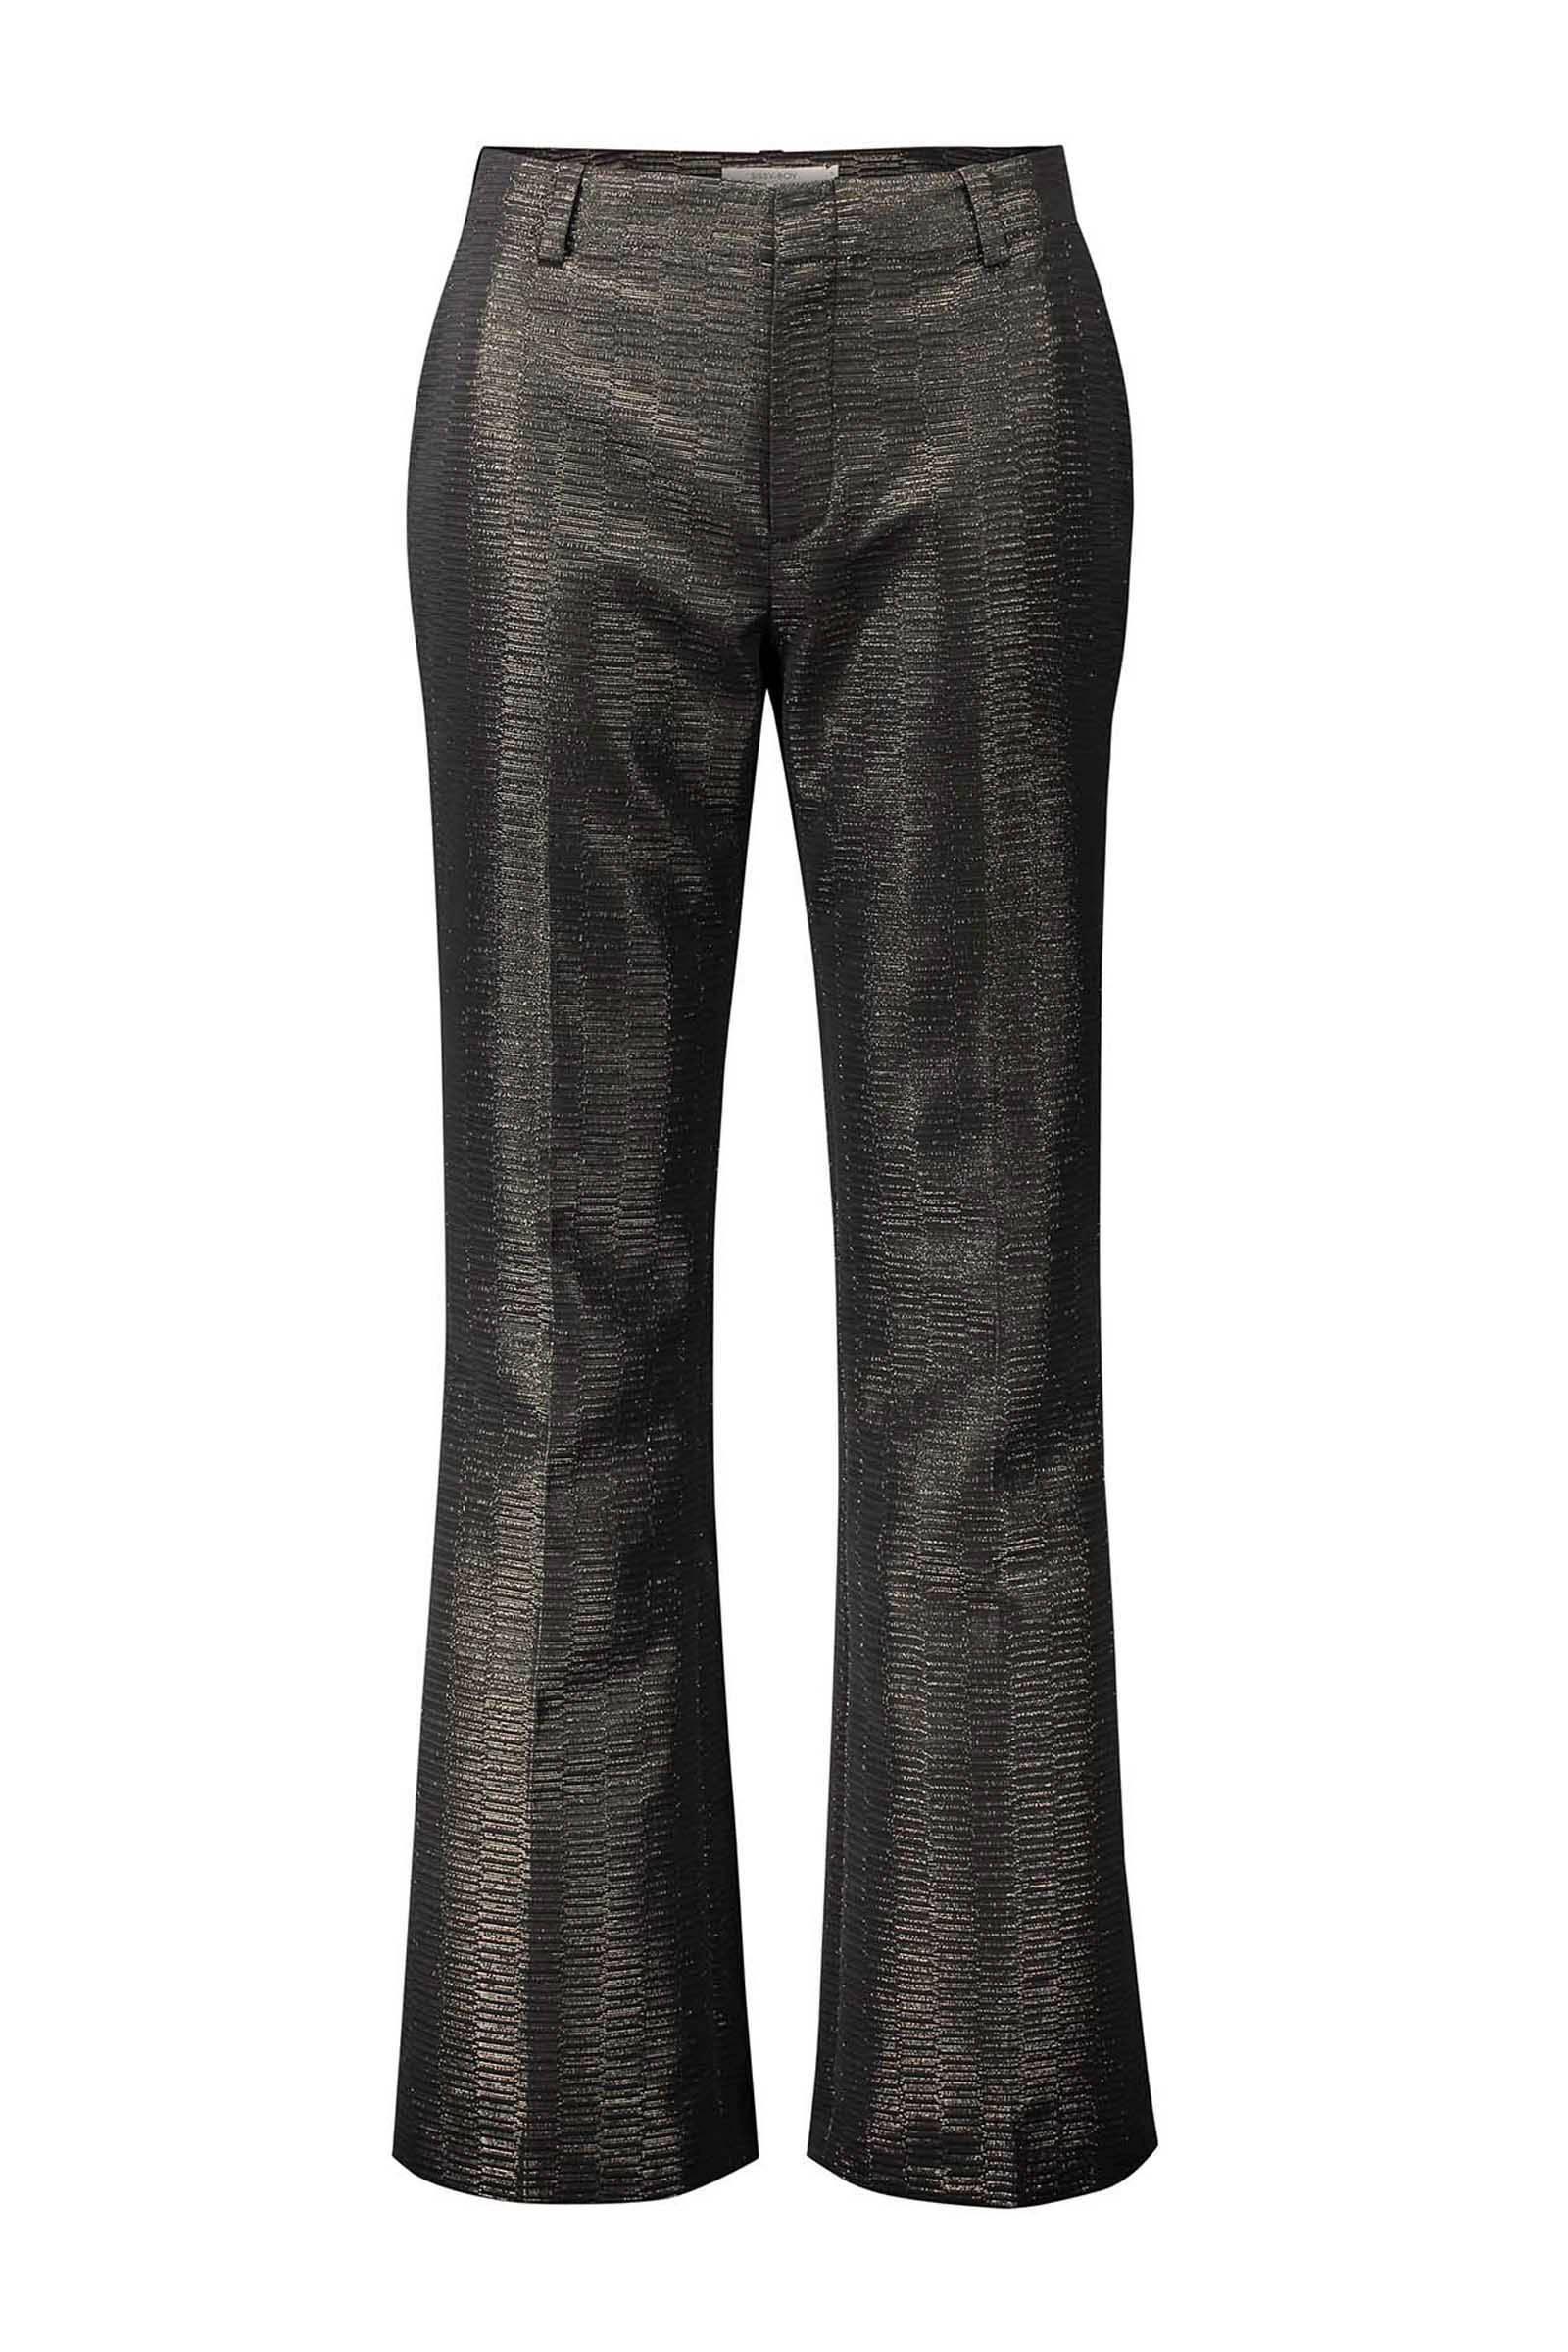 Sissy Boy metallic trui | wehkamp